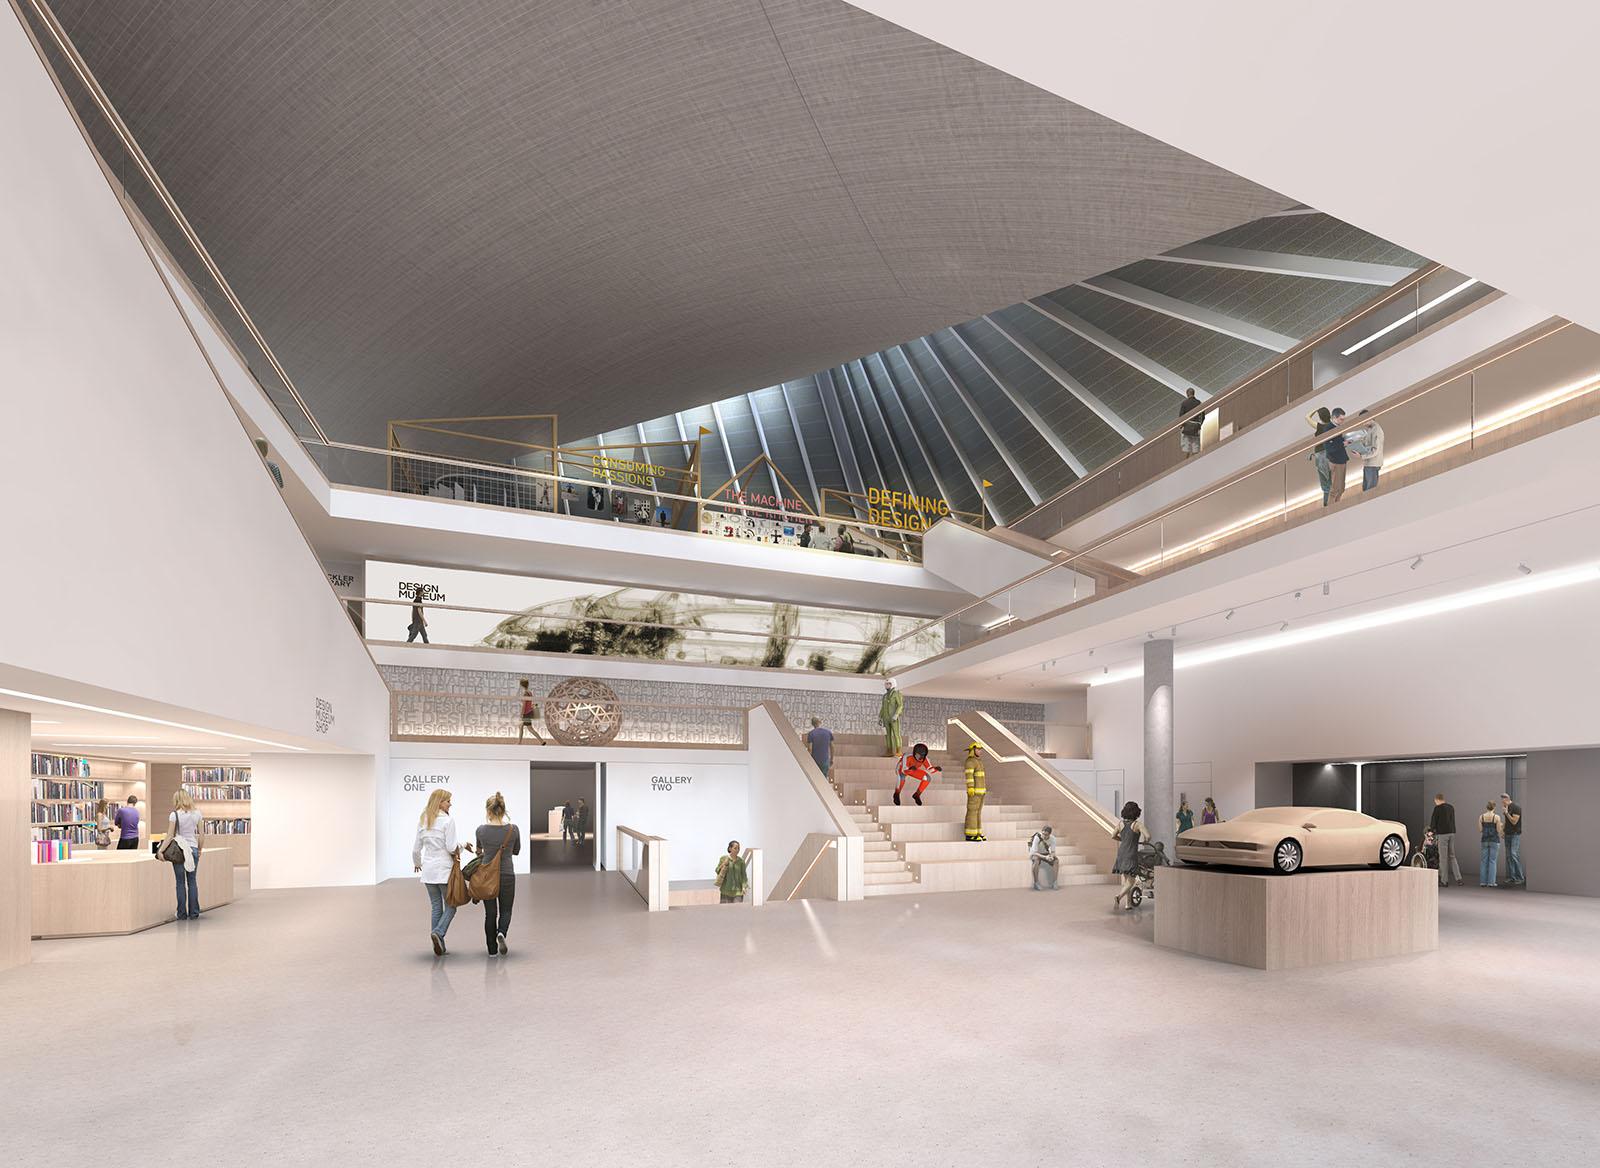 New Design Museum in Kensington